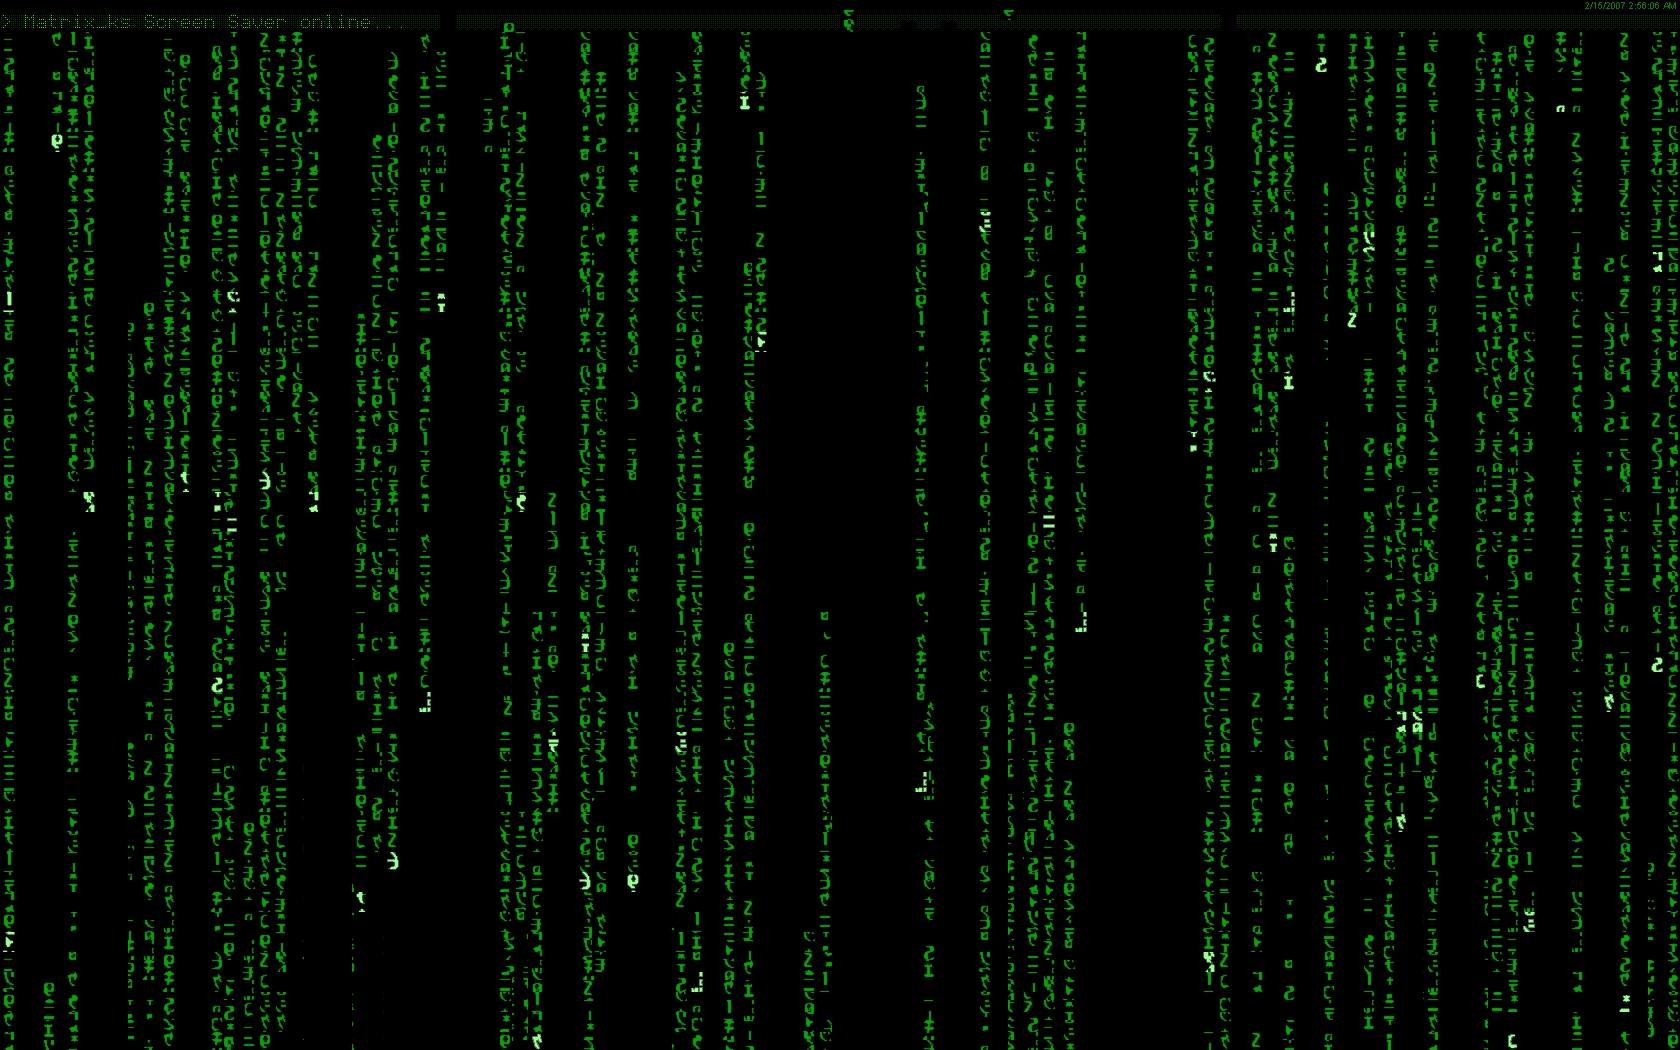 Matrix Wallpaper 1920x1080px 850366 1680x1050